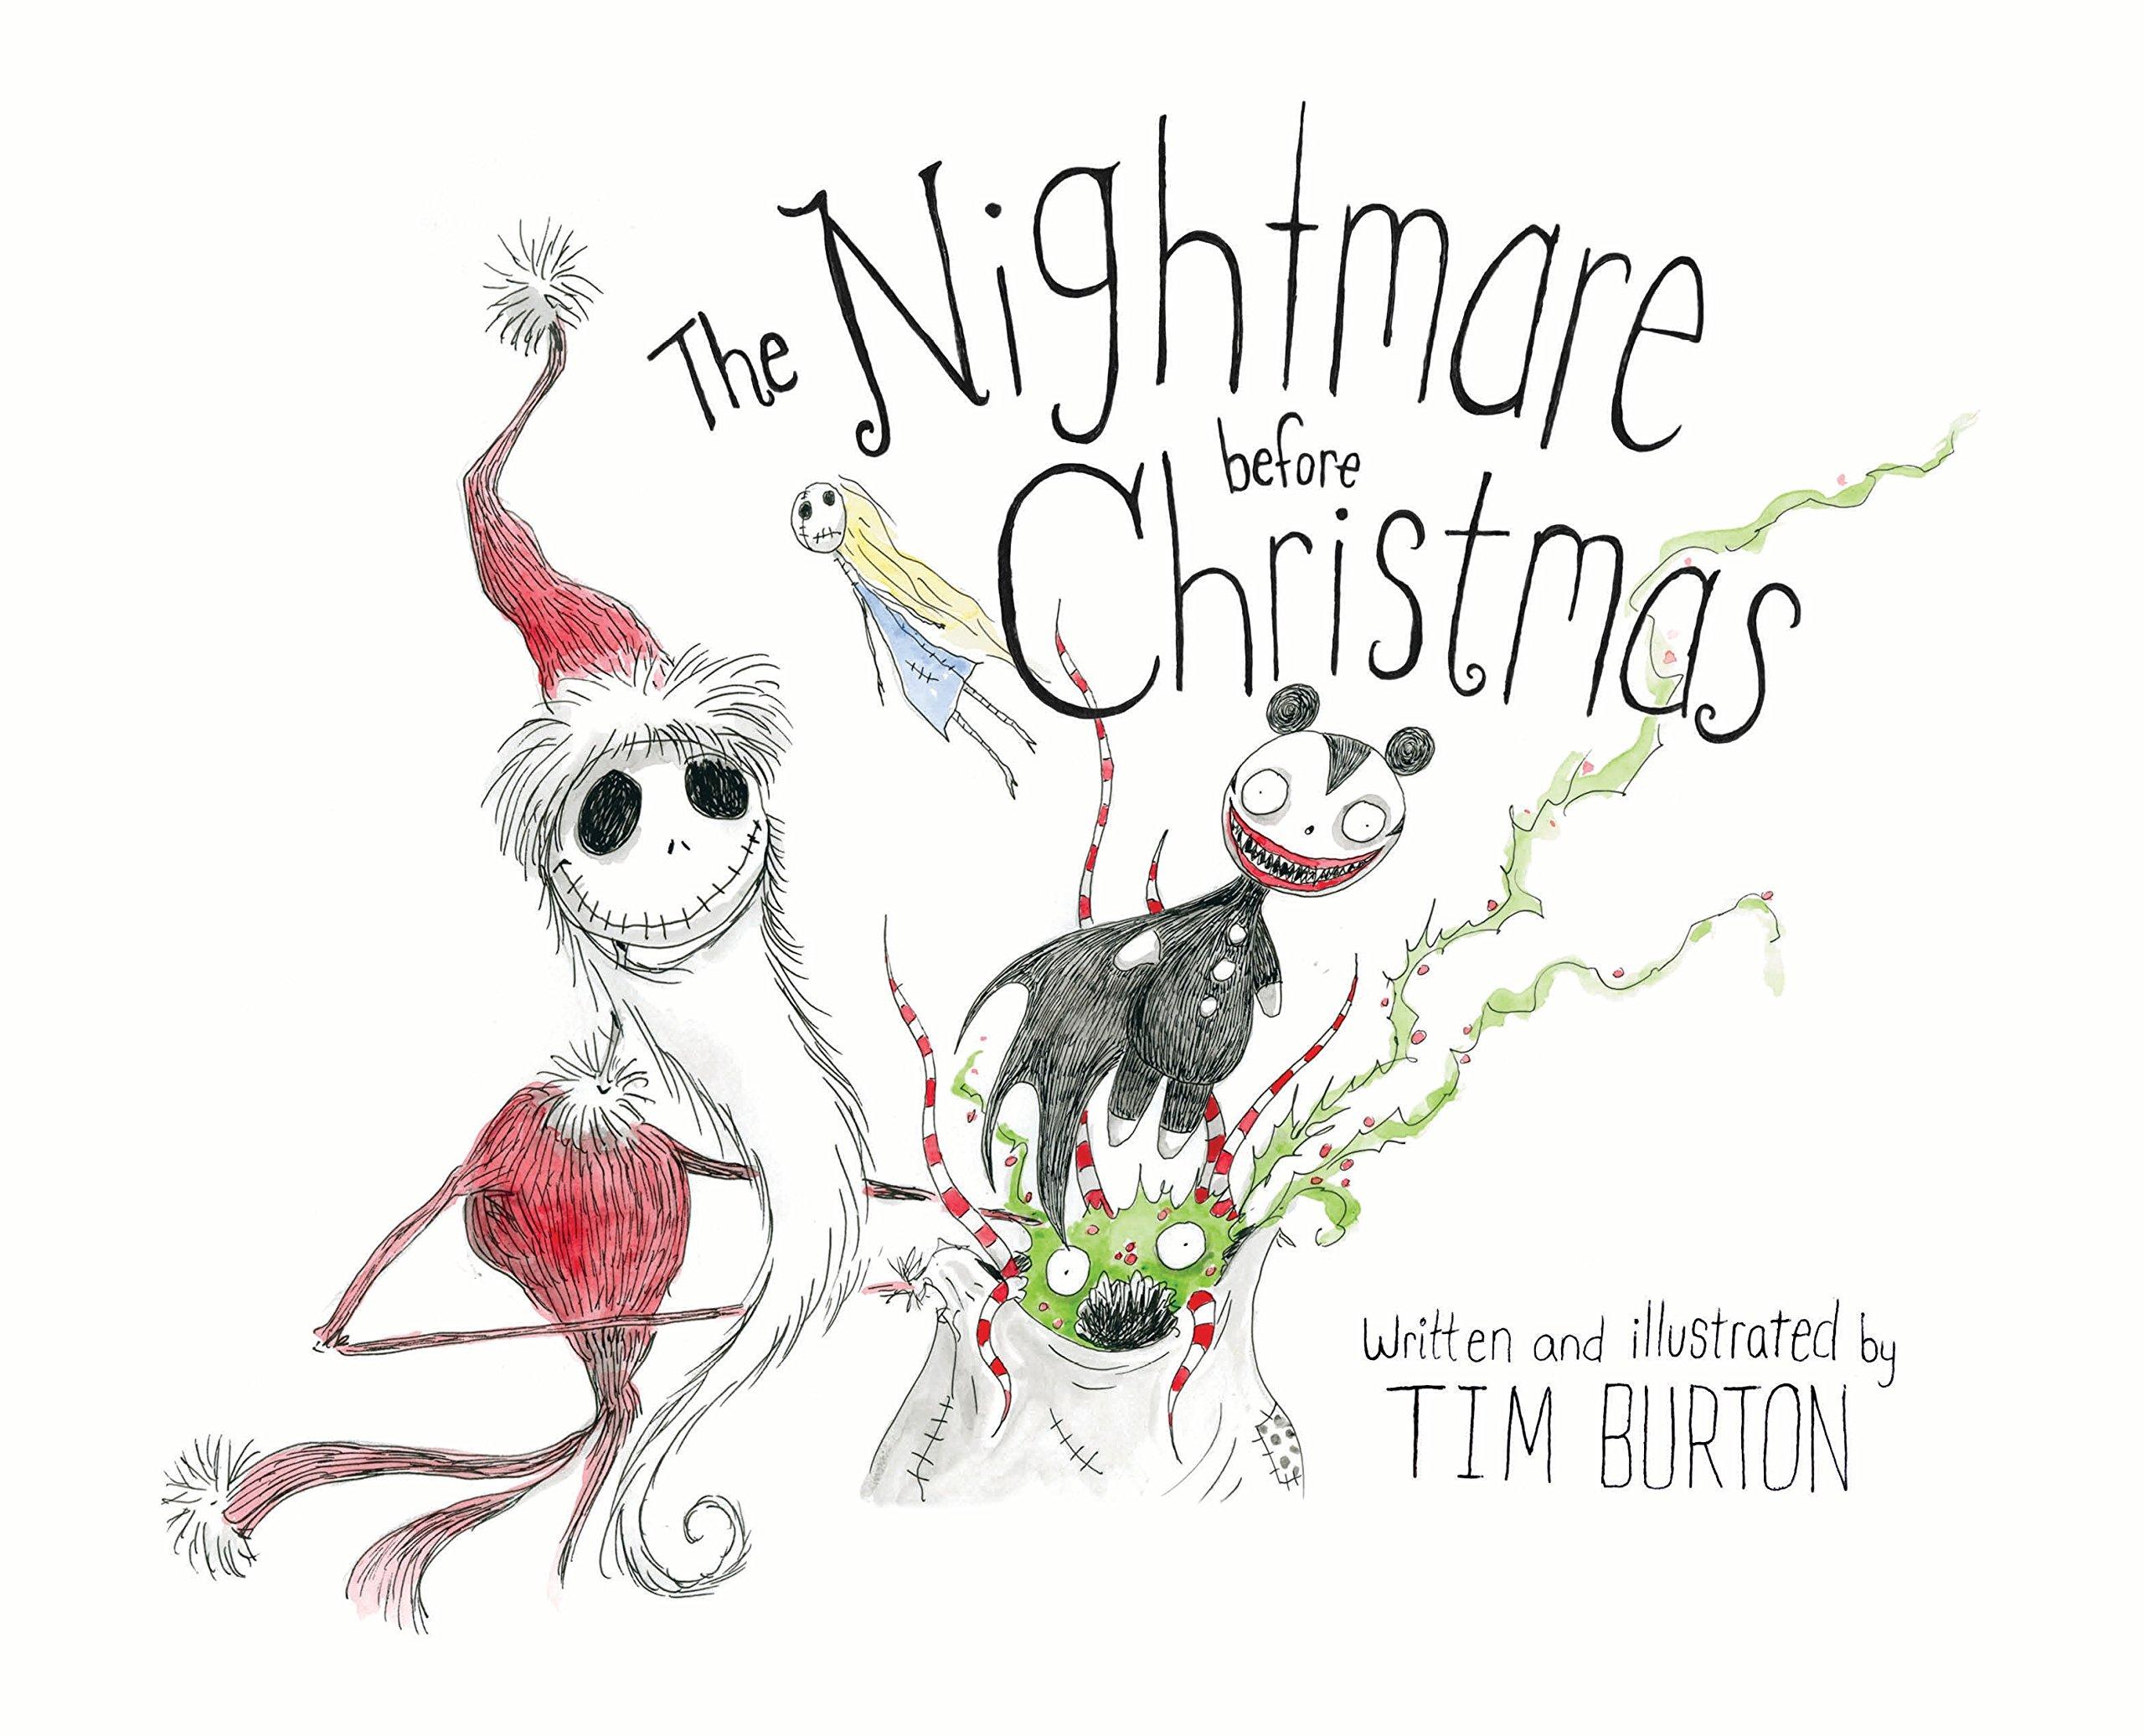 The Nightmare Before Christmas: Amazon.es: Burton, Tim: Libros en idiomas extranjeros